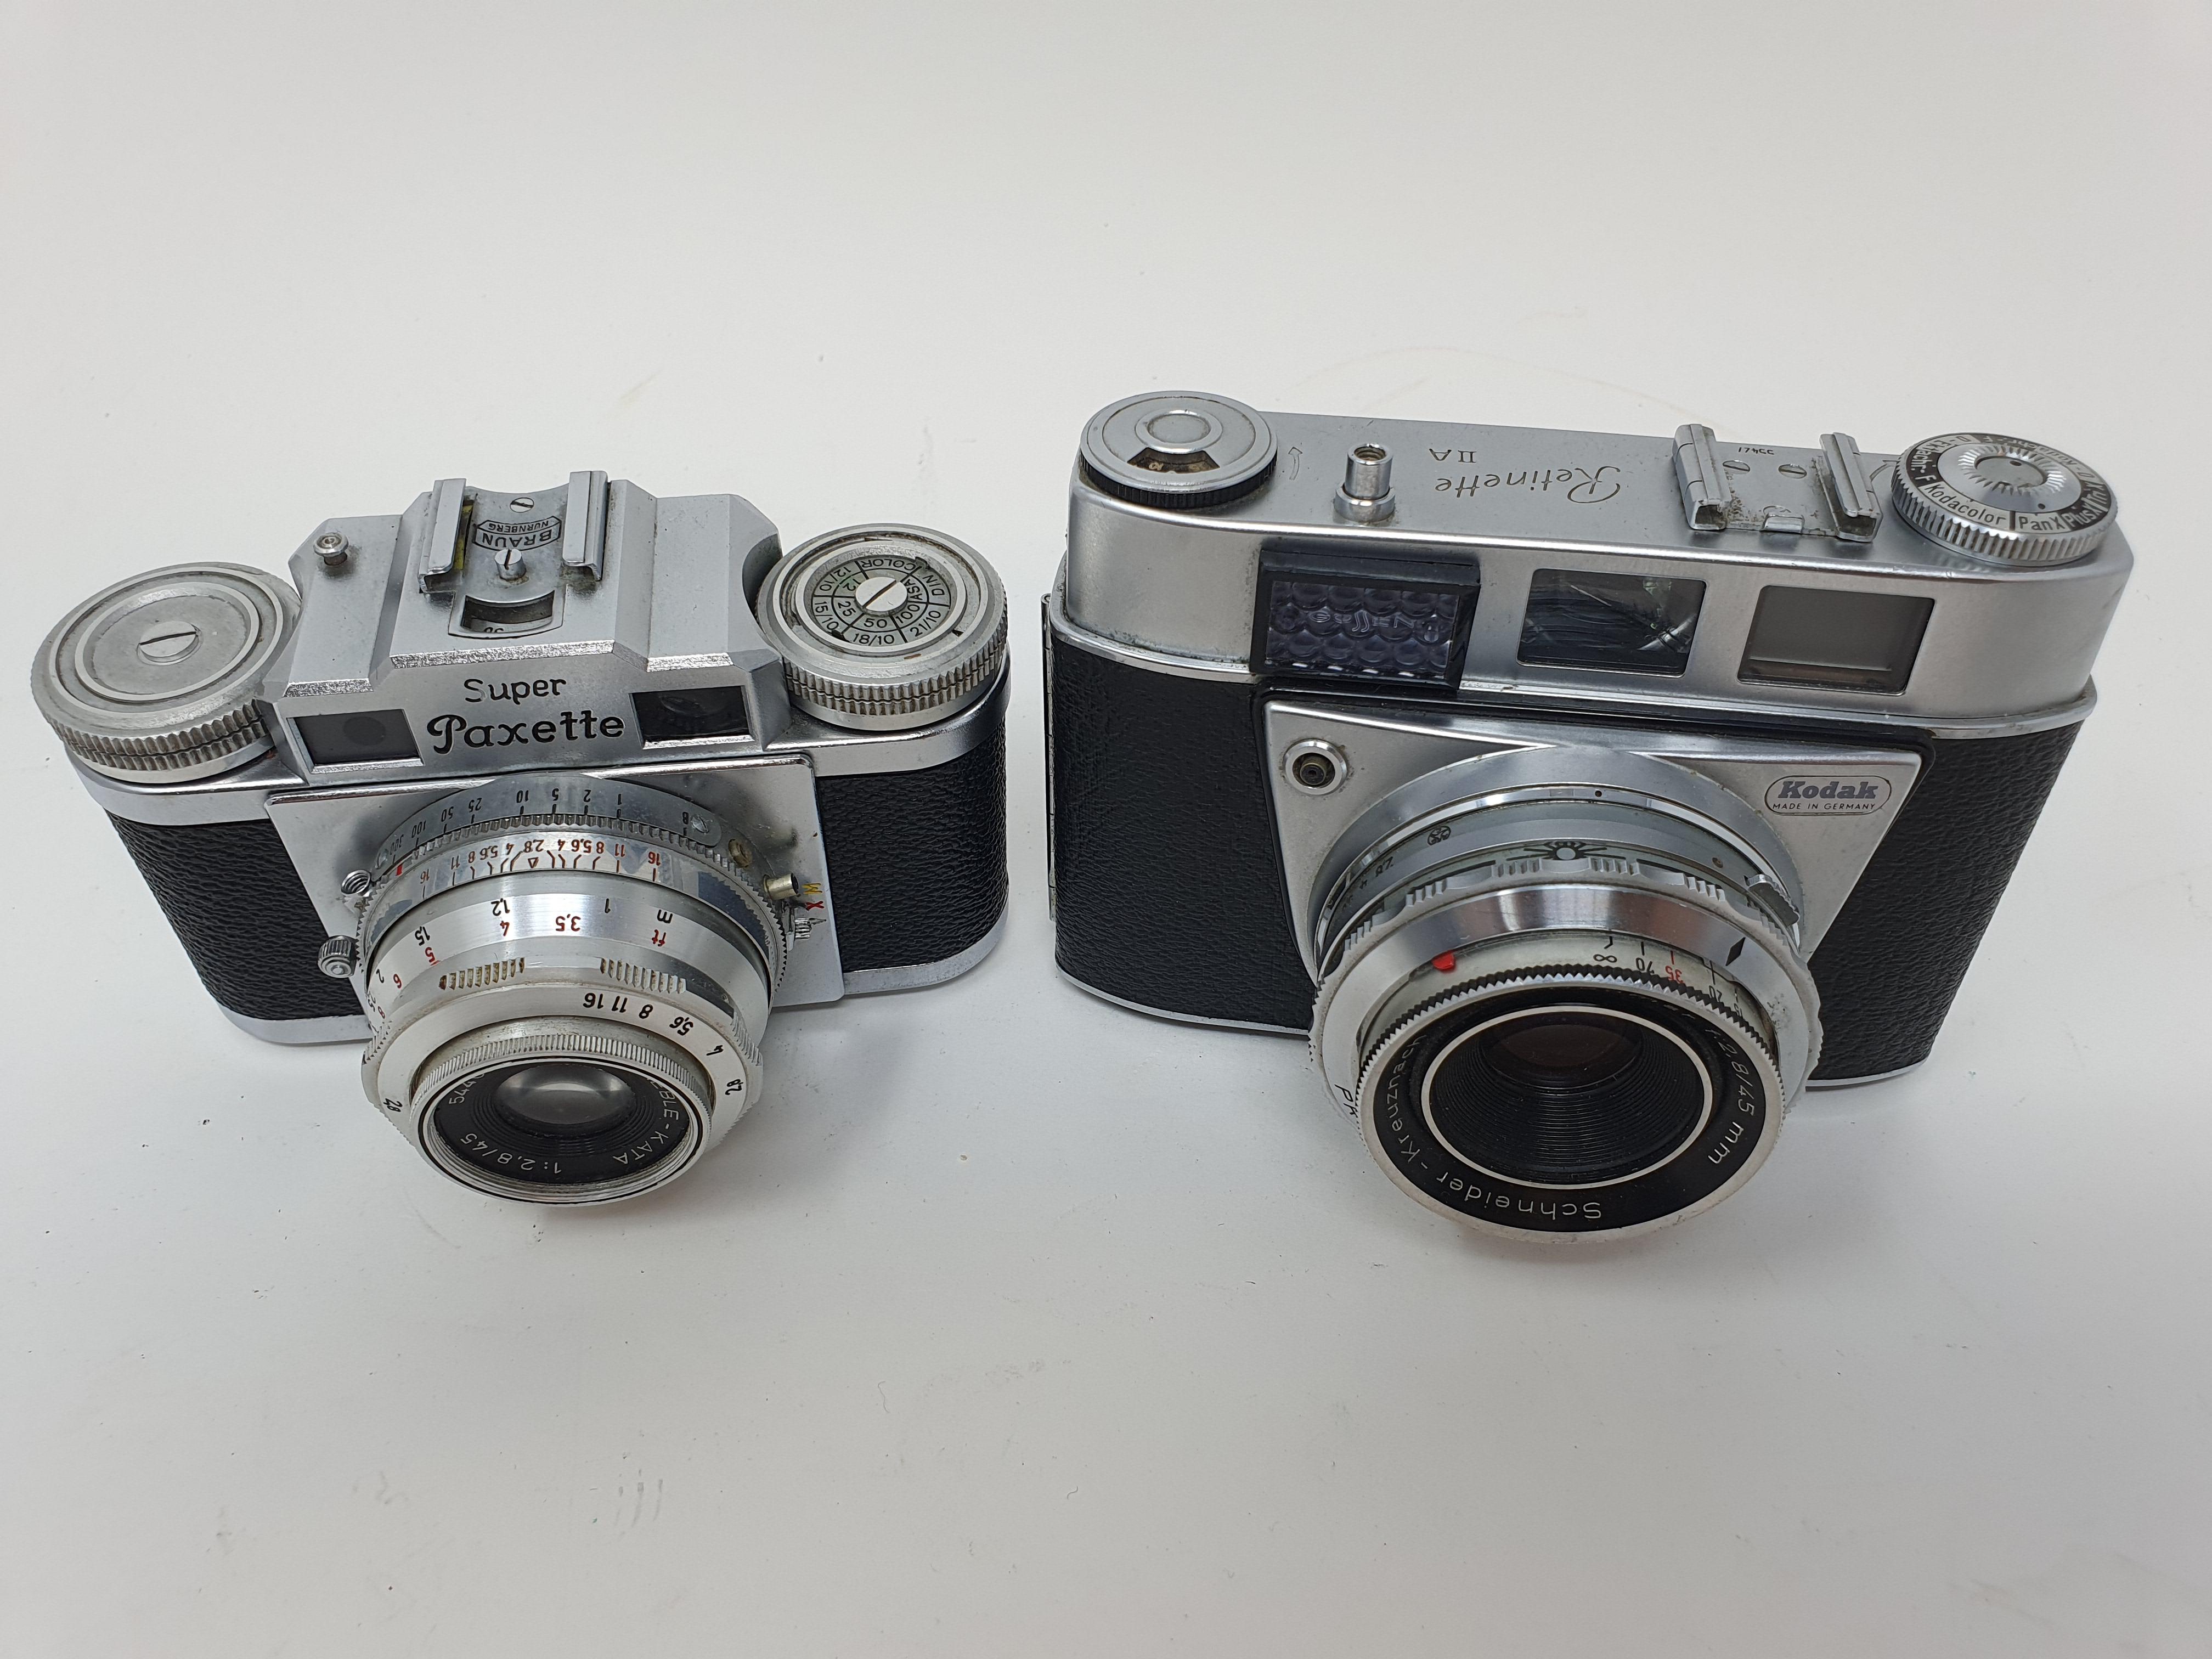 A Kodak Retinette IIA camera and a Braun Super Paxette camera (2) Provenance: Part of a vast - Image 2 of 4